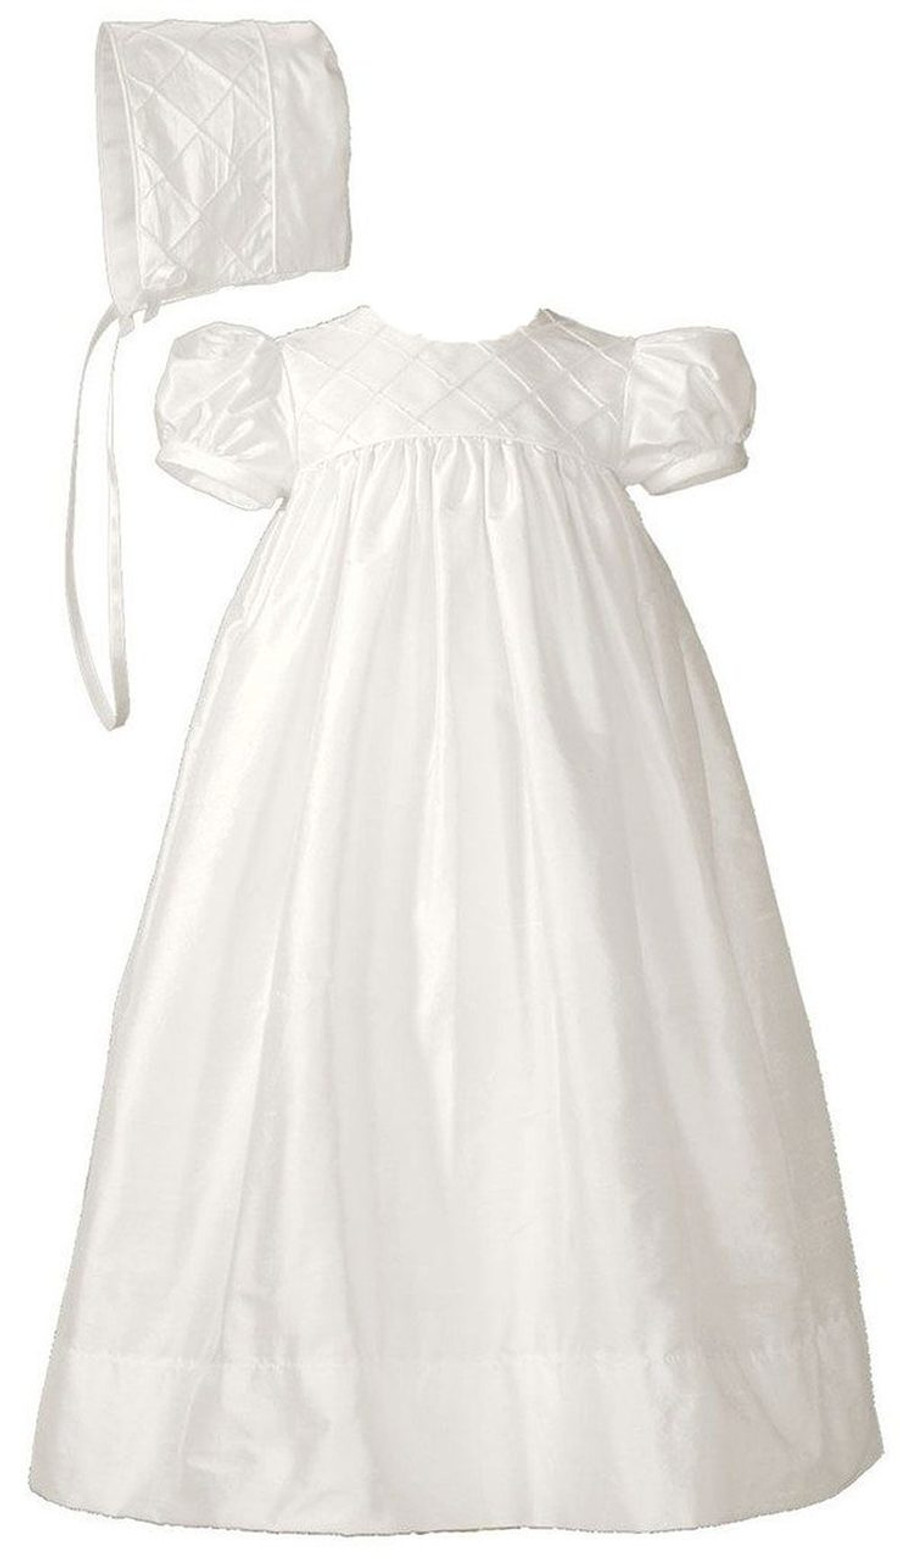 Girls Silk Dupioni Dress Baptism Gown with Lattice Bodice